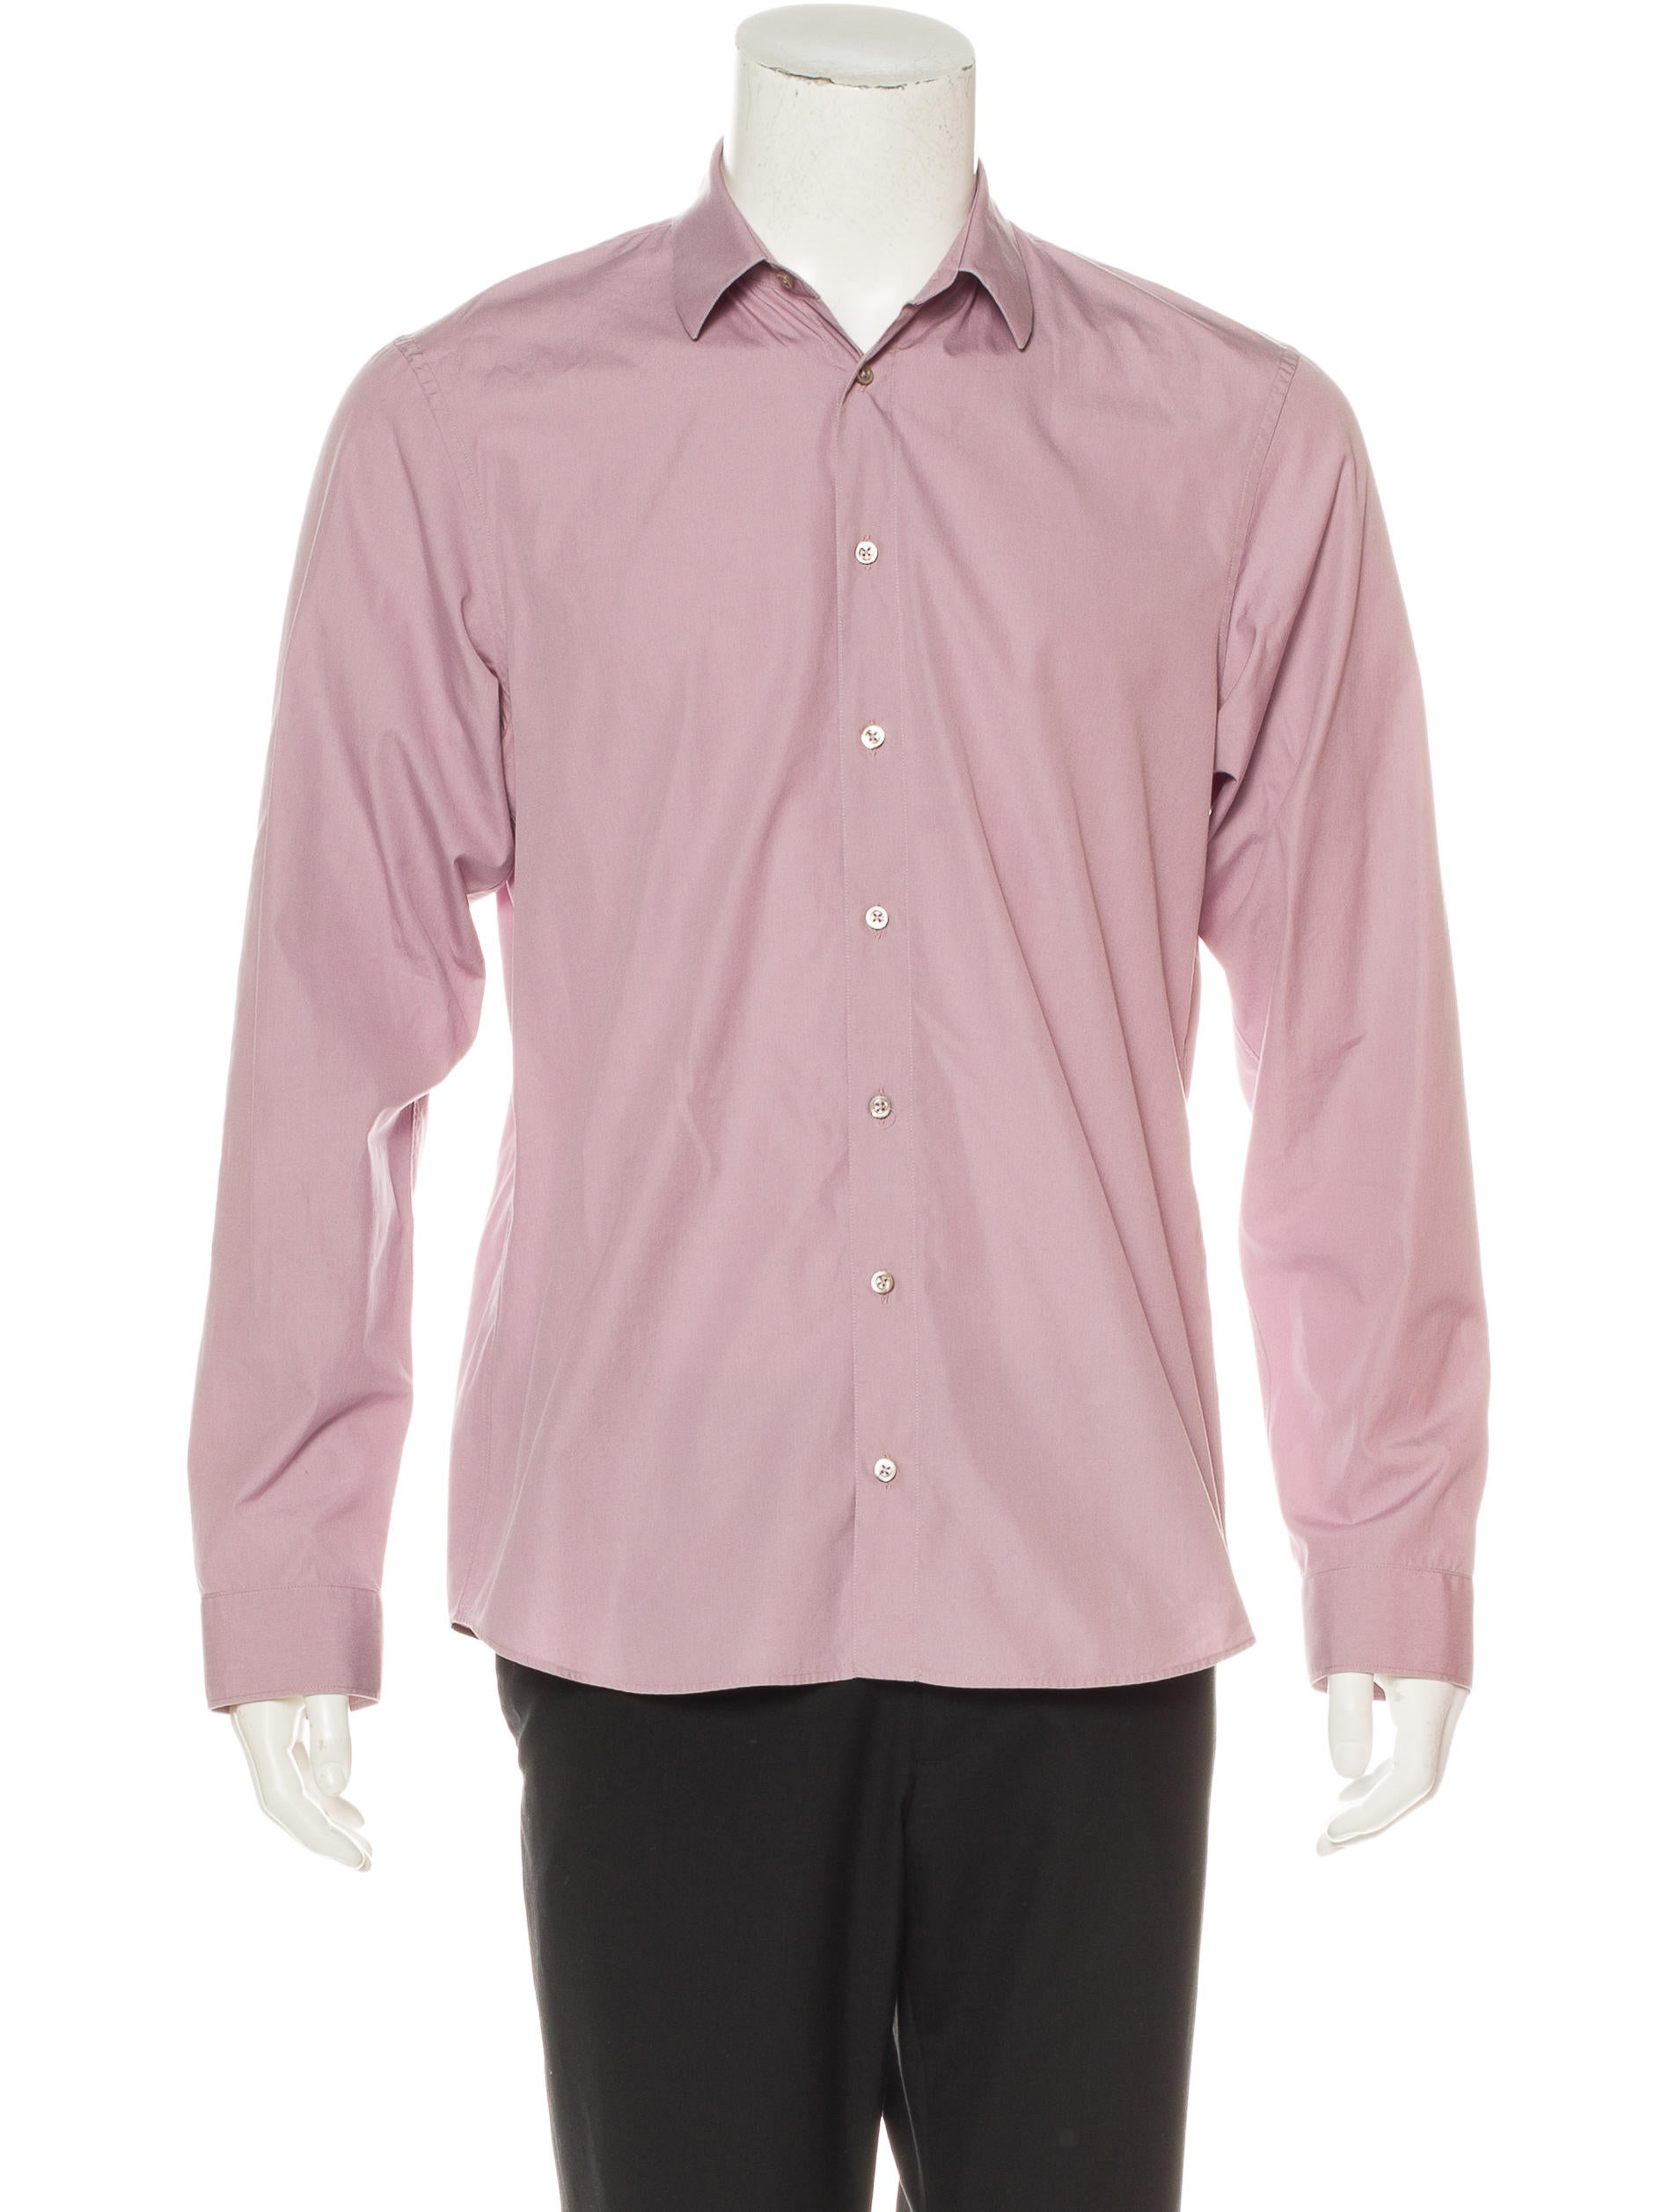 Jil sander woven dress shirt clothing jil36640 the for Jil sander mens shirt